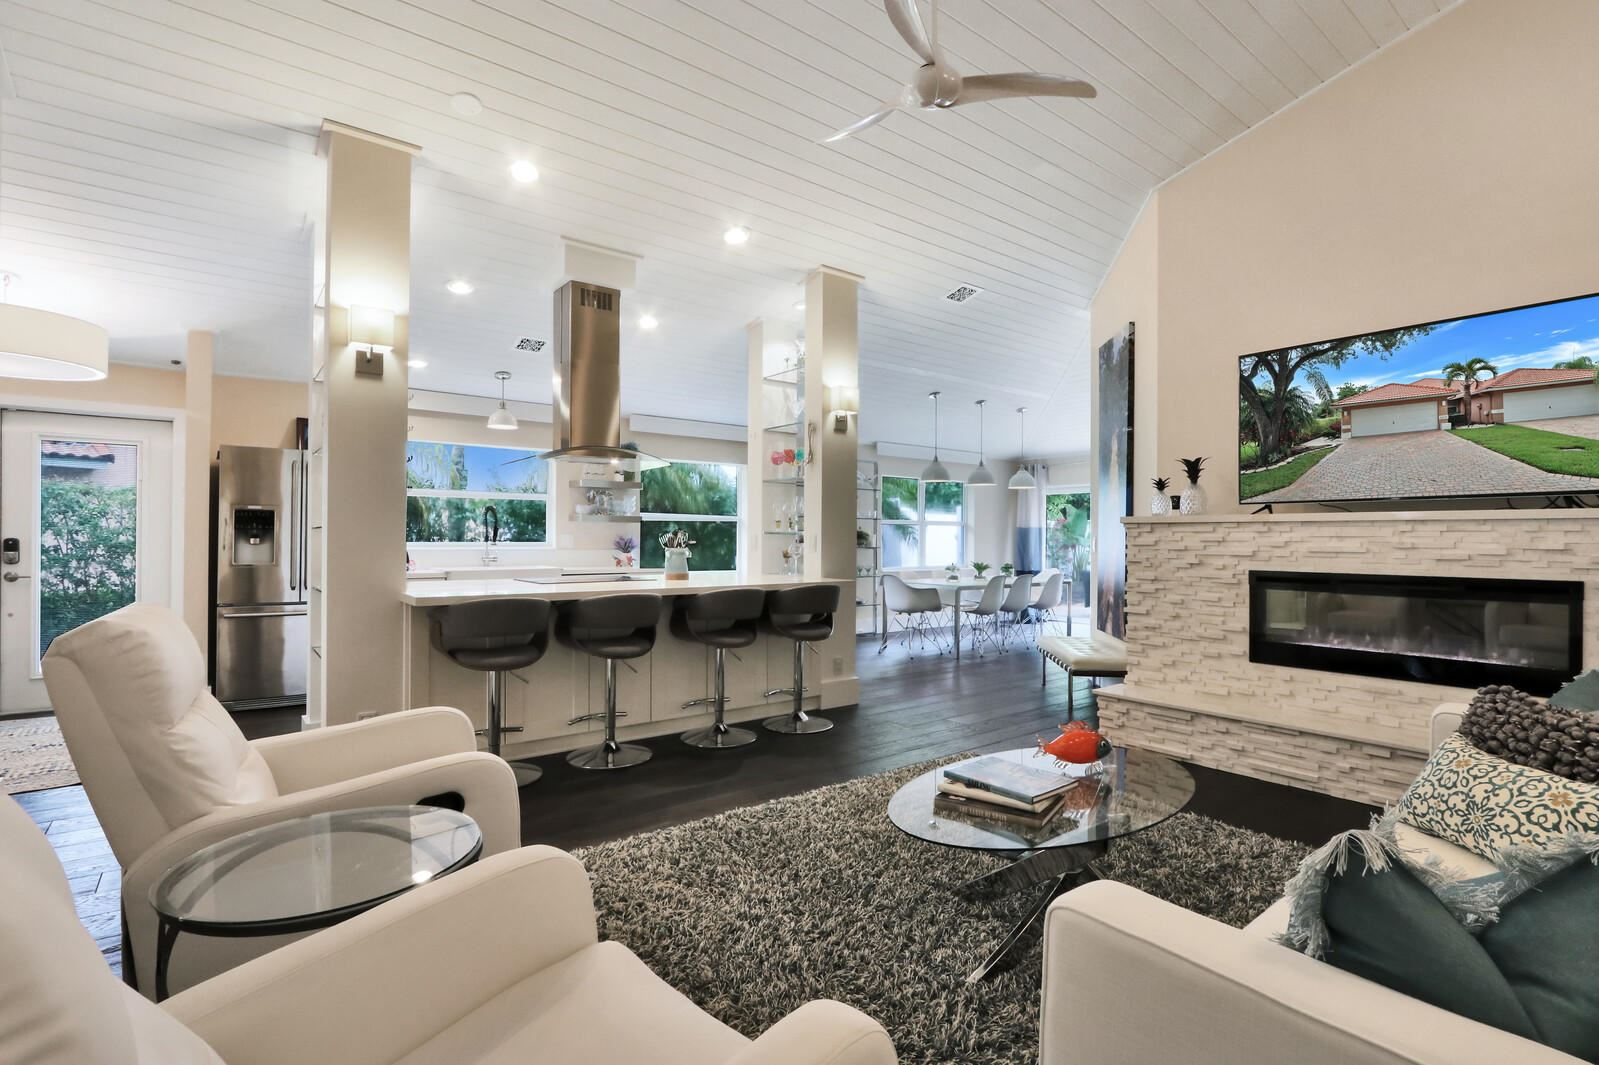 5279 Grande Palm Circle, Delray Beach, FL 33484 - #: RX-10634465